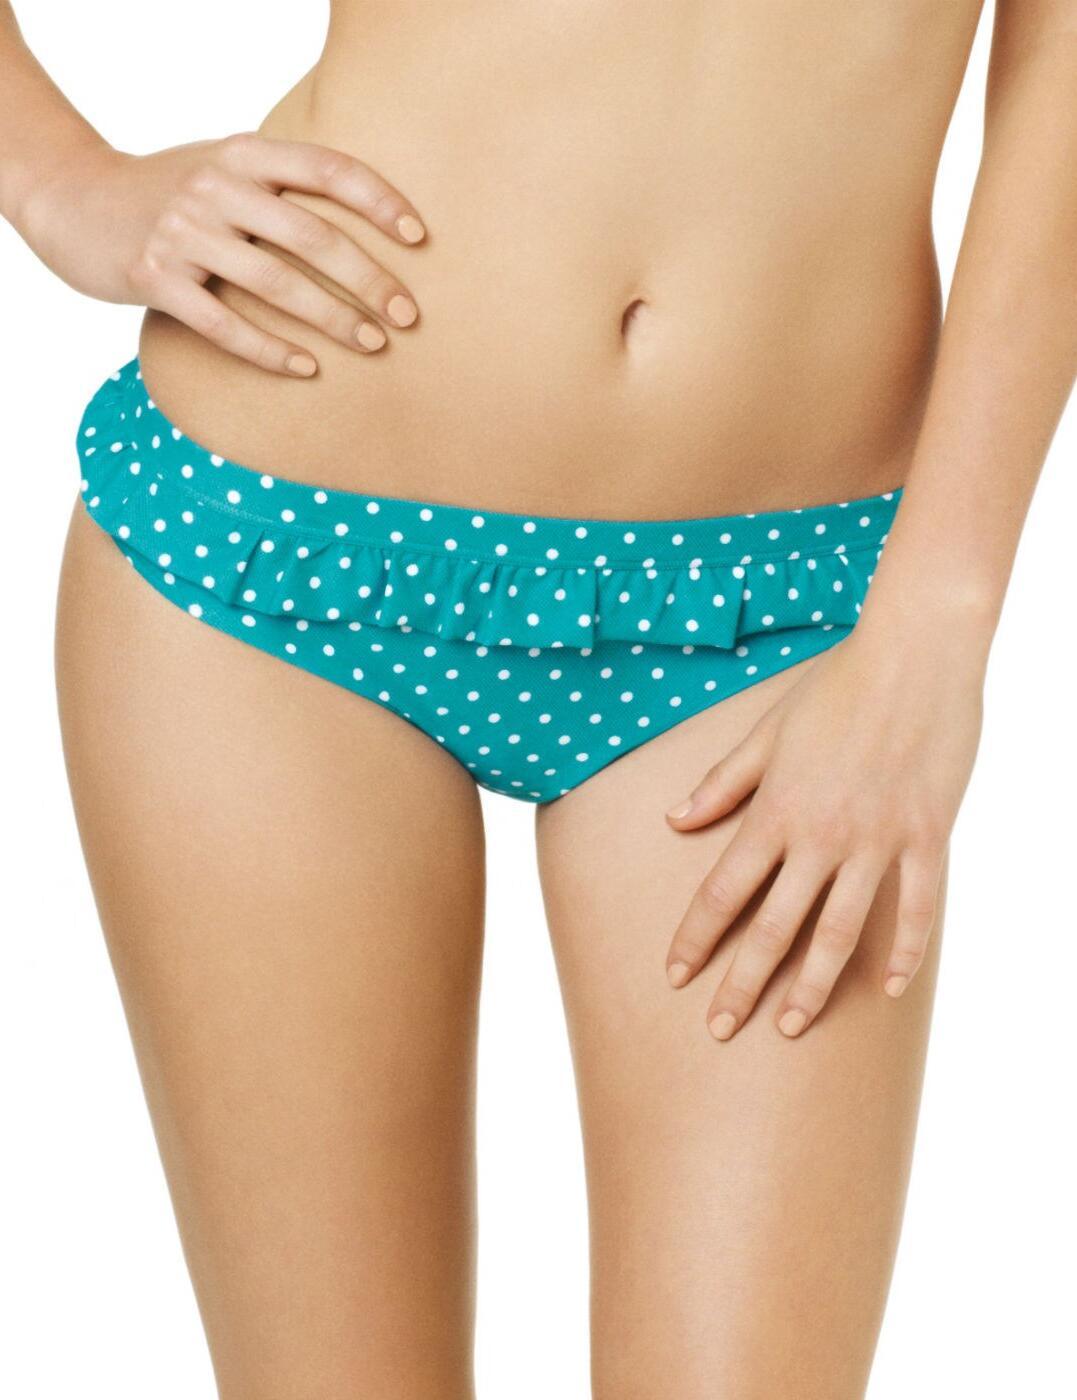 SW0039 Cleo Swimwear Betty Frill Bikini Brief - CW0039 Frill Pant